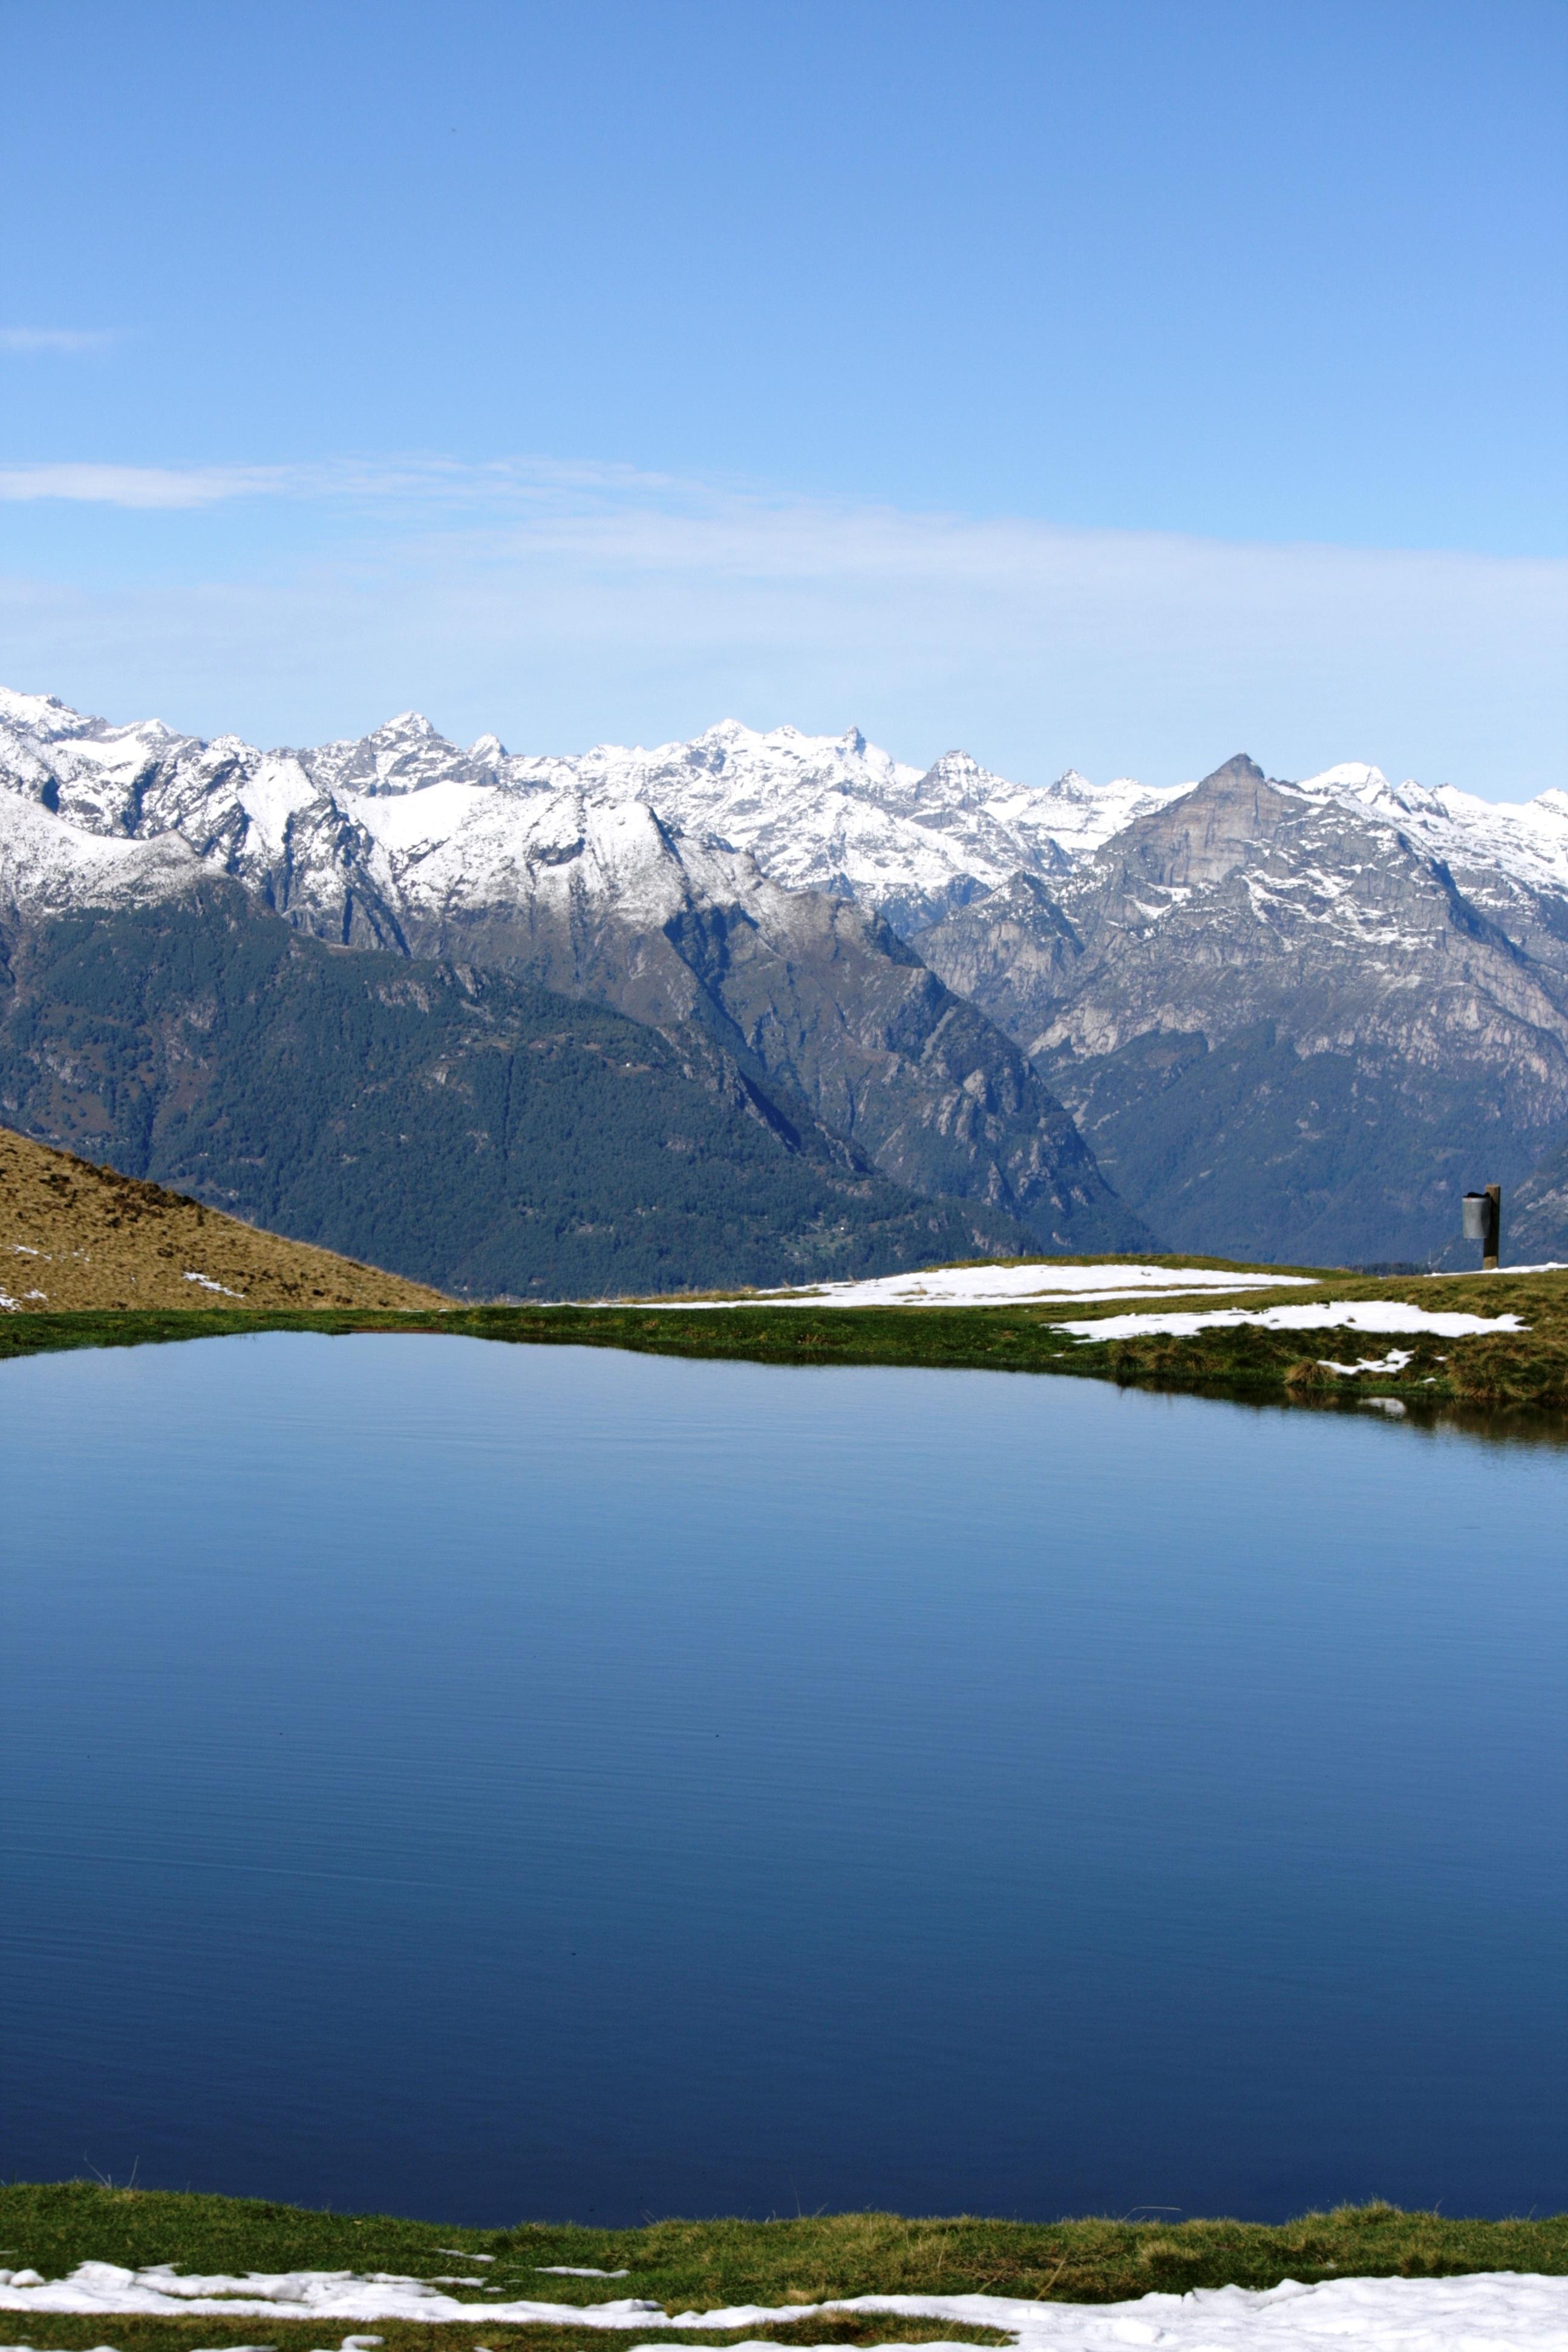 2b15249d7ba landscape nature wilderness mountain snow lake mountain range reflection  fjord reservoir body of water alps plateau